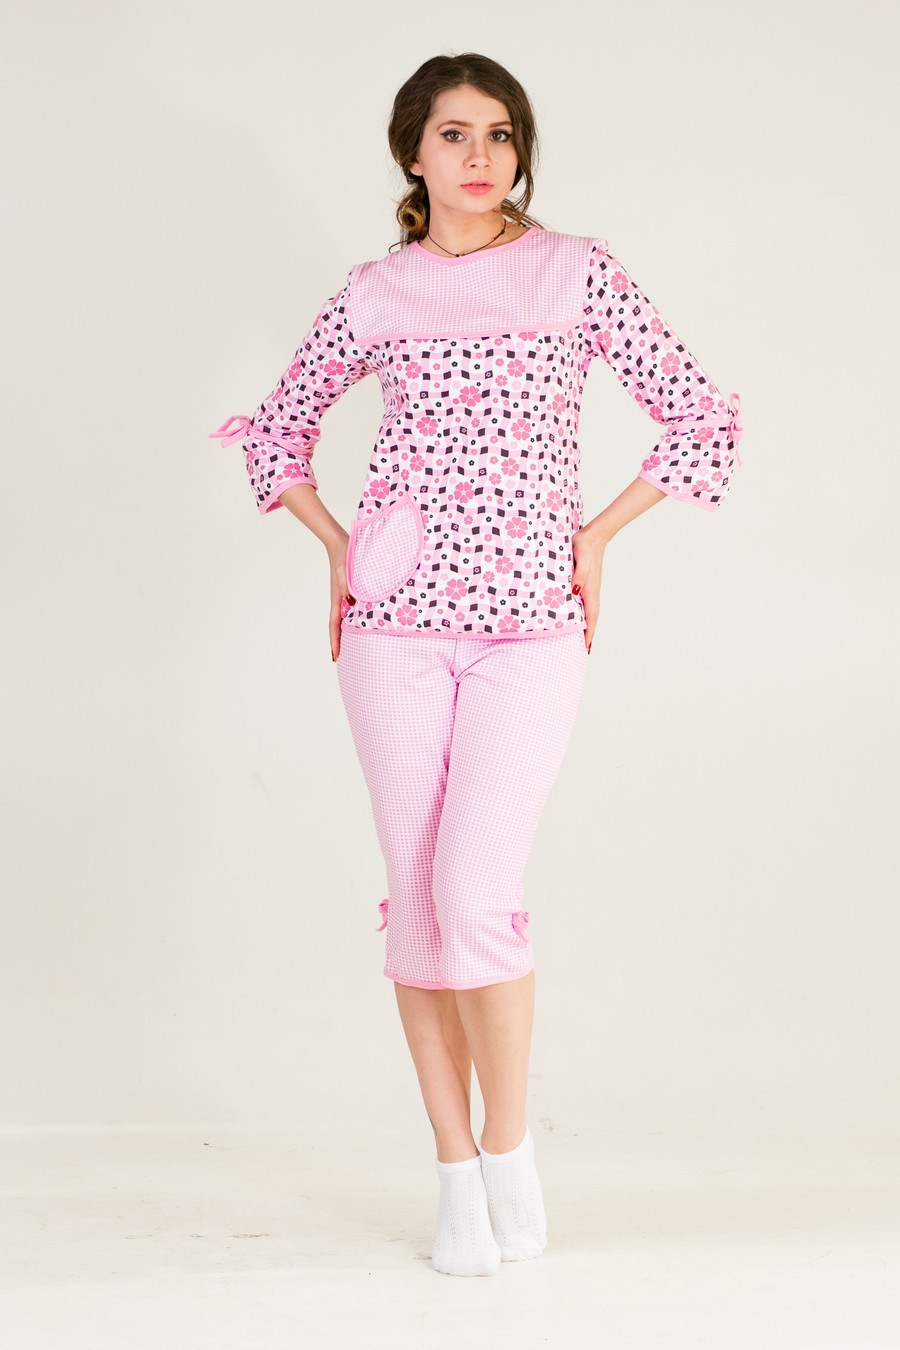 Пижама Катя Цветочки кофта +бриджиДомашняя одежда<br><br><br>Размер: 46